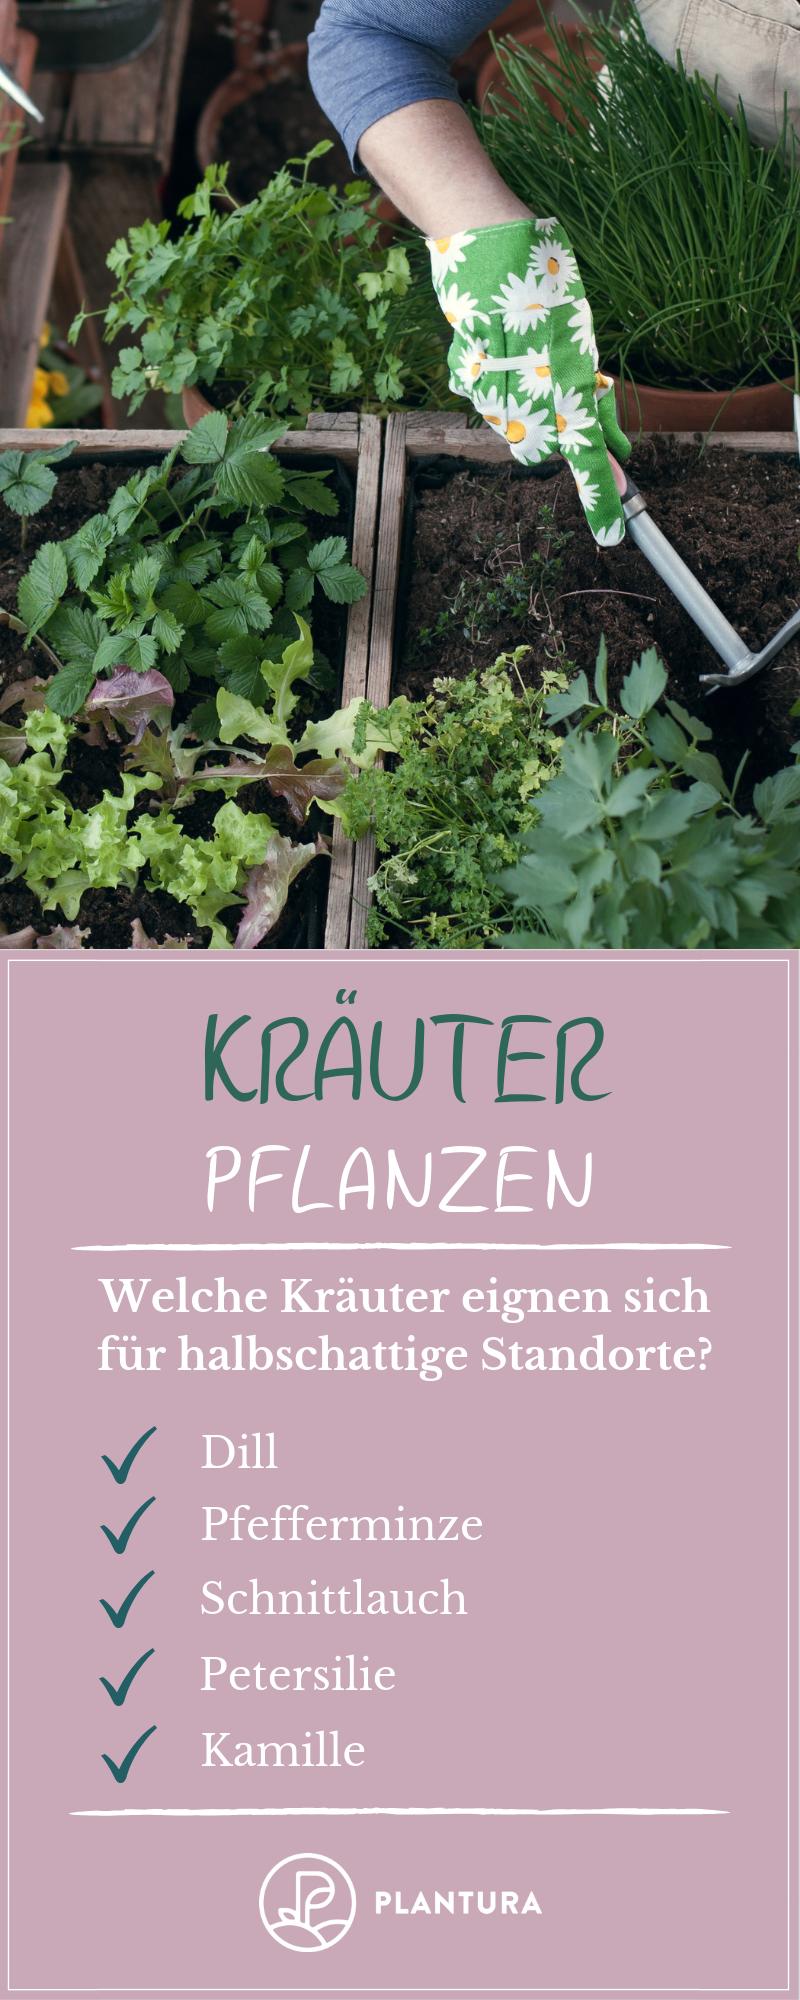 Kräuter pflanzen: Anleitungen & Tipps für Fensterbrett, Balkon & Beet #kleinekräutergärten